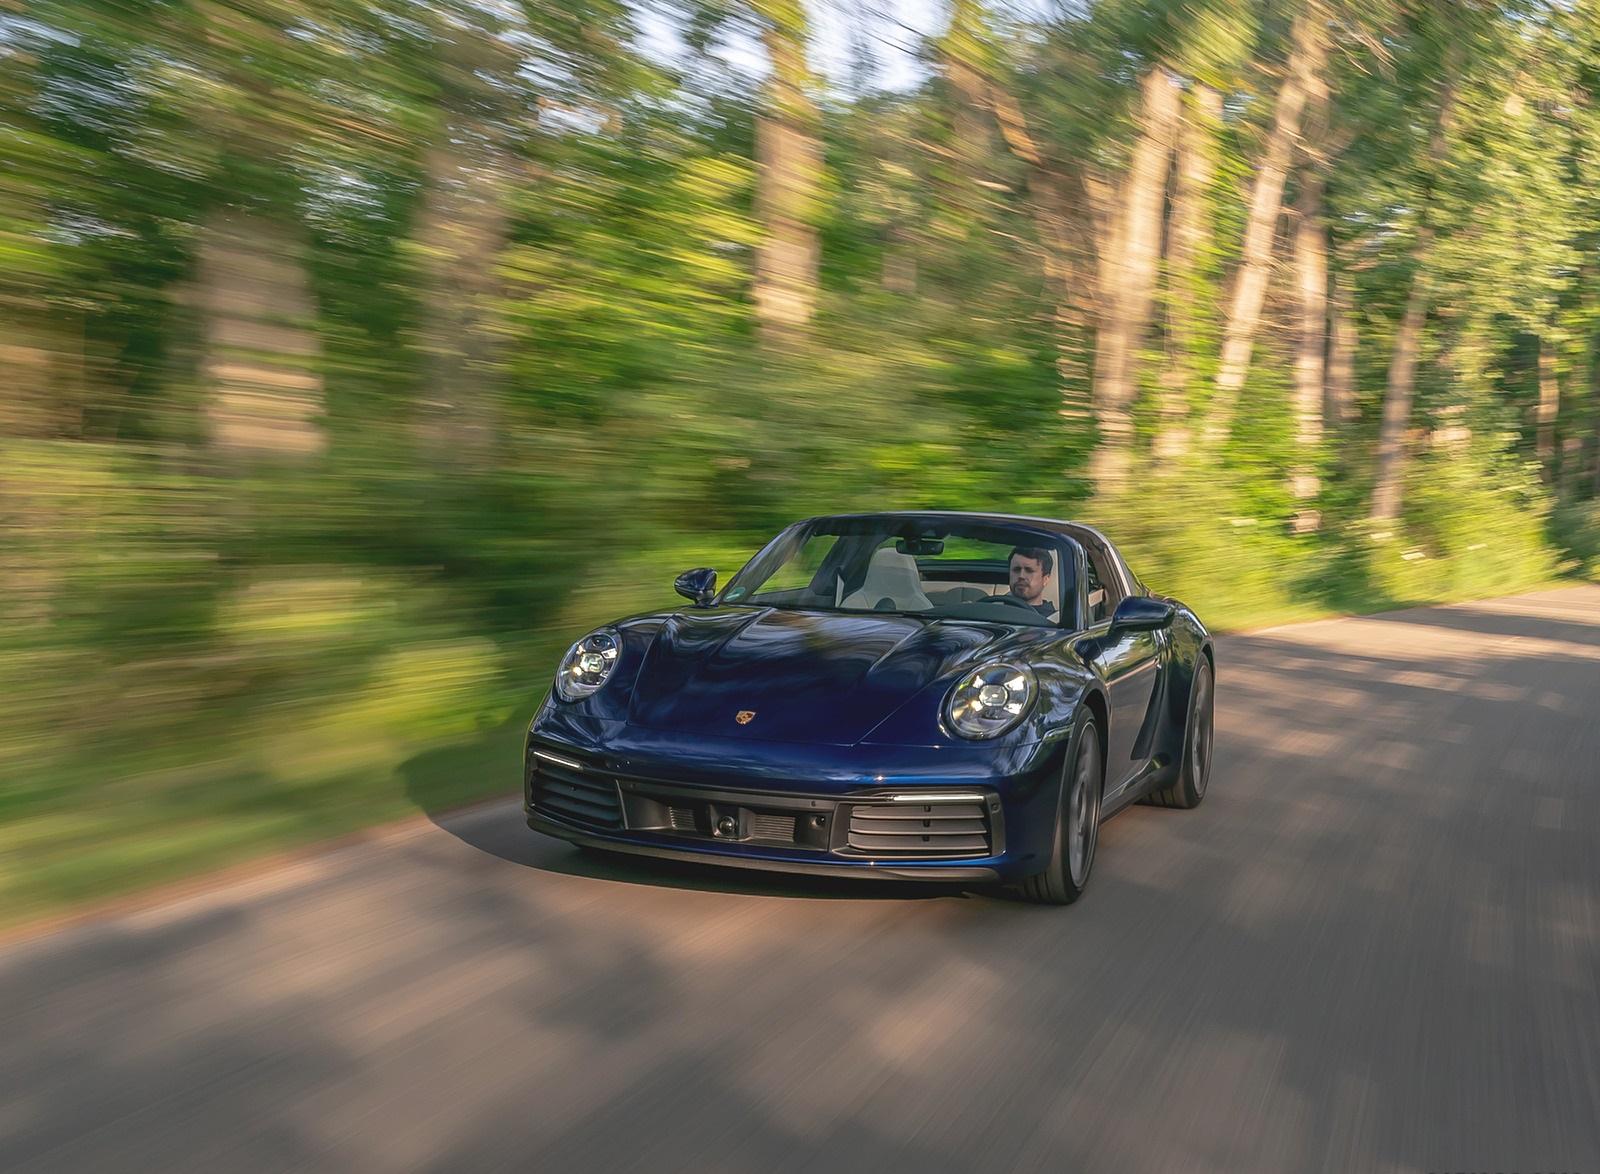 2021 Porsche 911 Targa 4 (Color: Gentian Blue) Front Wallpapers (4)